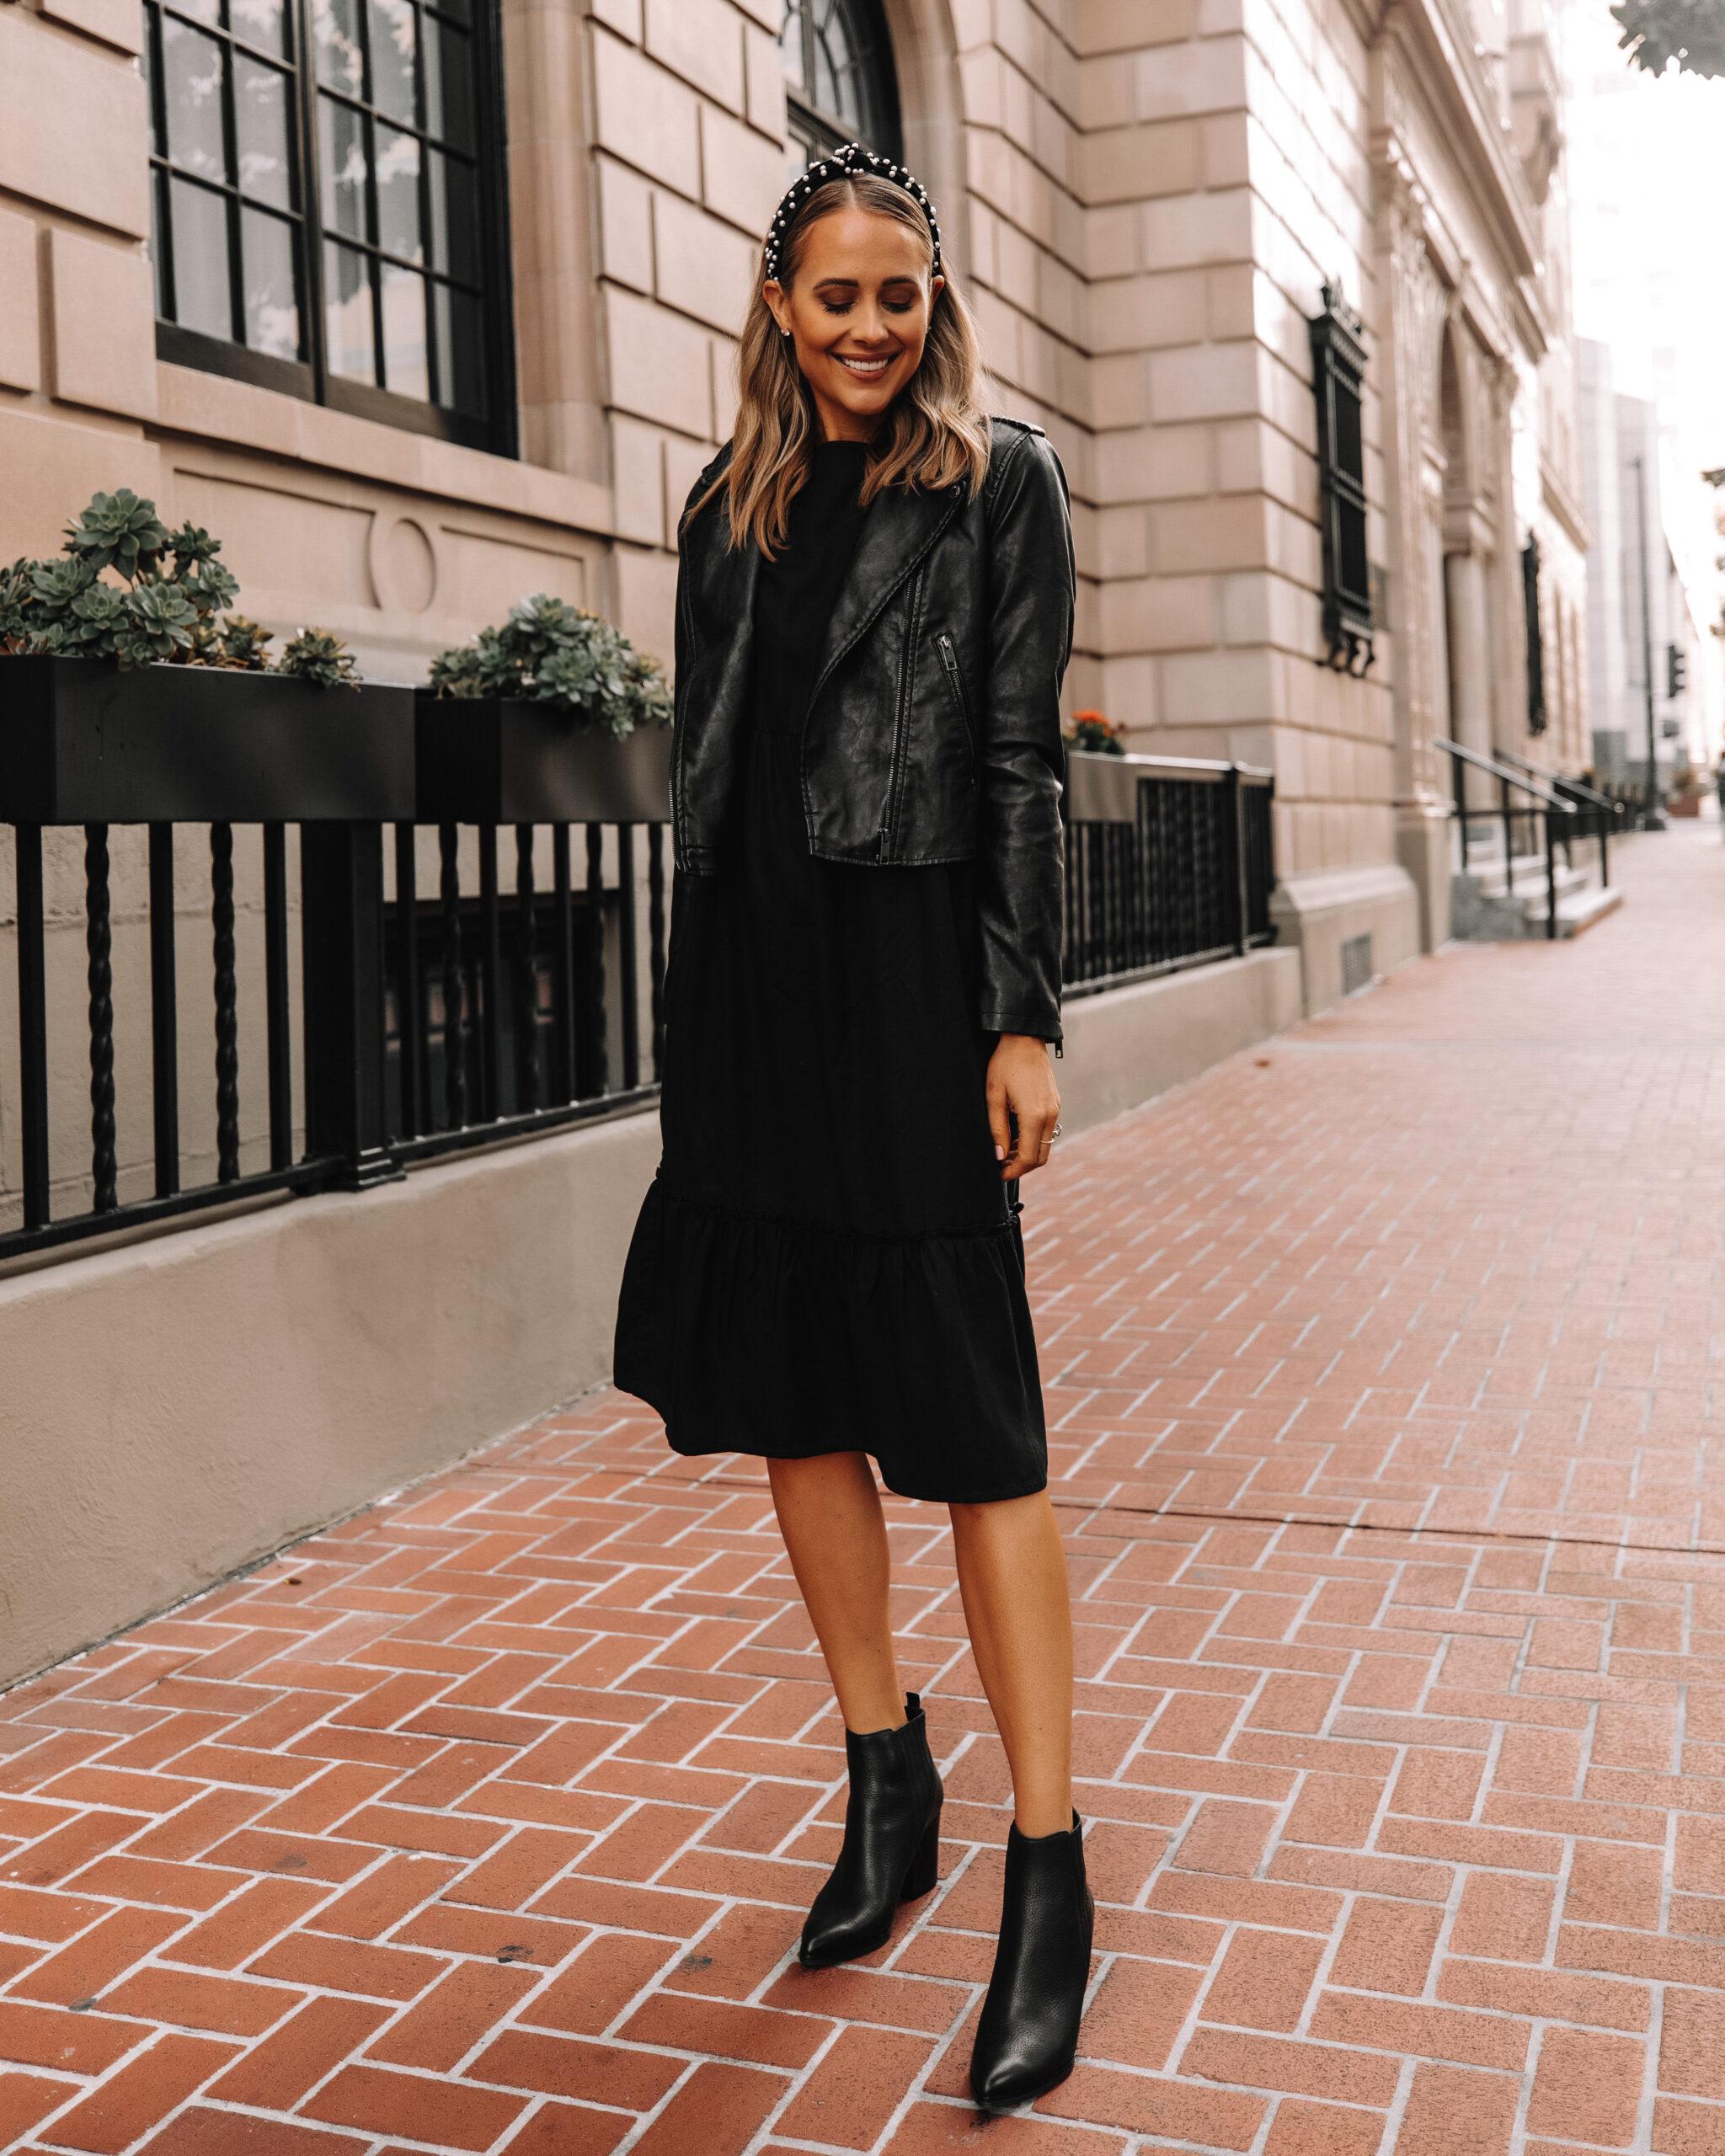 Fashion Jackson Wearing Amazon The Drop Black Midi Dress Black Leather Jacket Black Booties